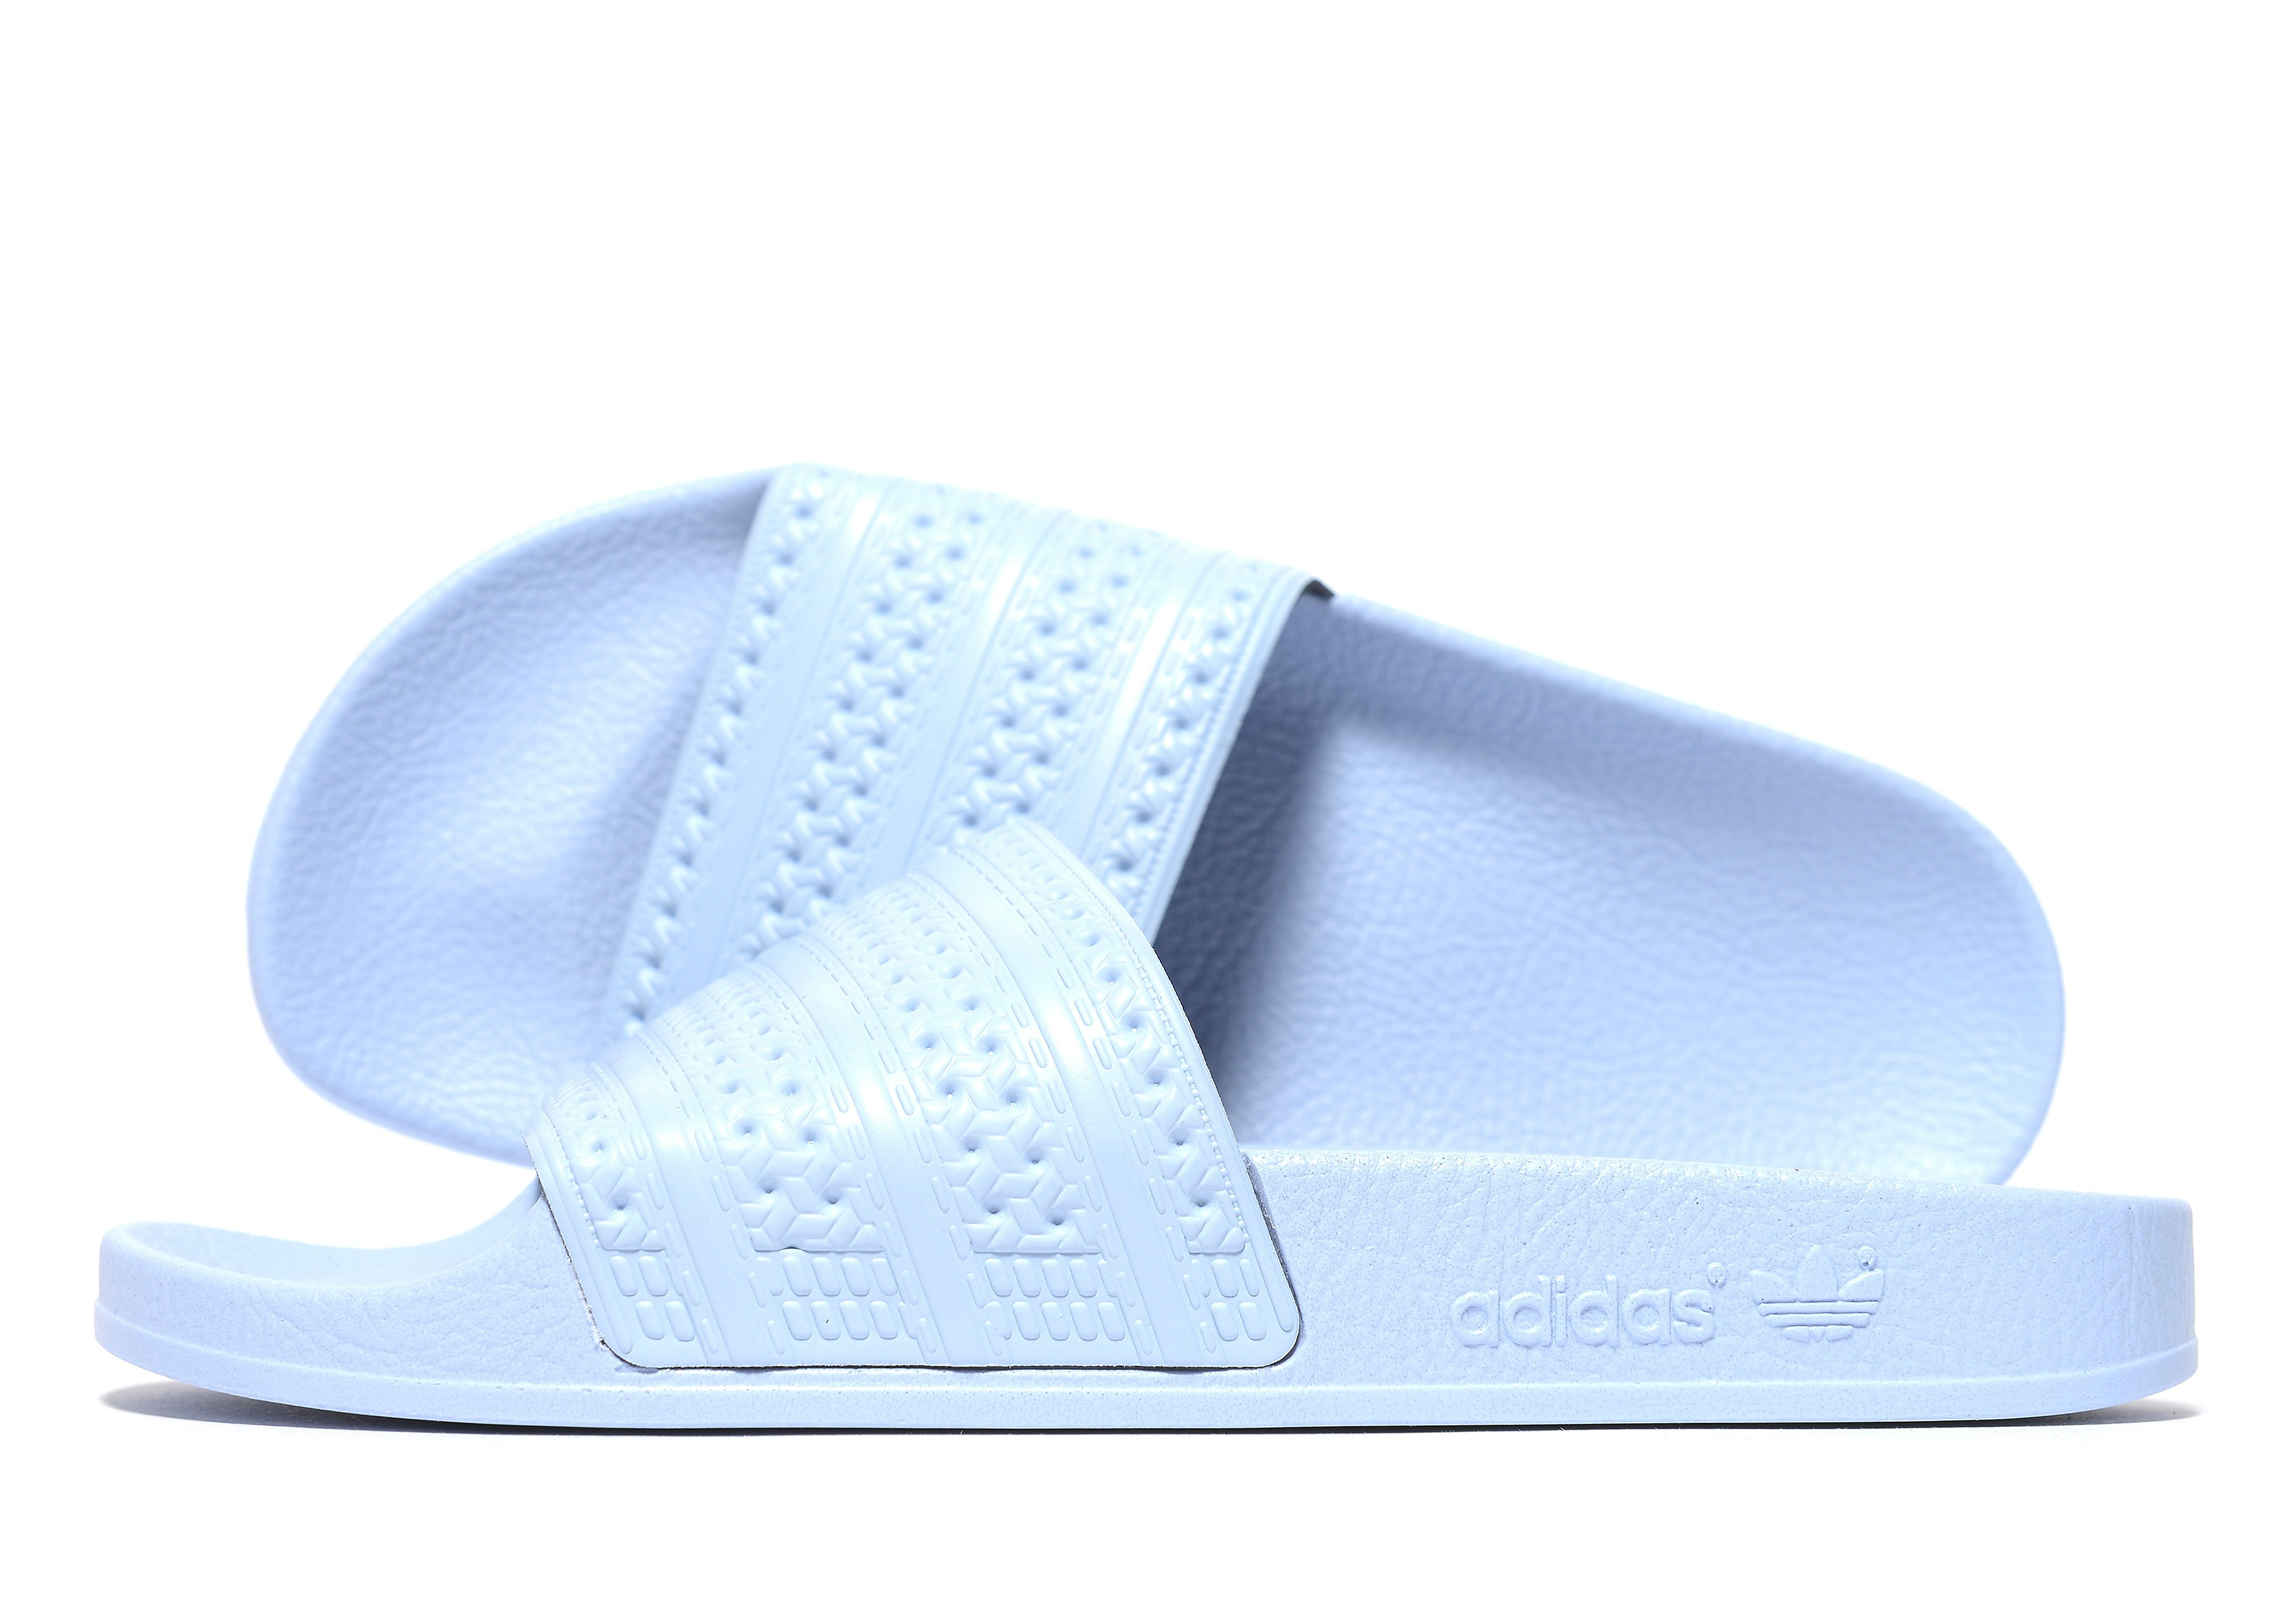 adidas Originals Adilette Slides Dames - Light Blue - Dames